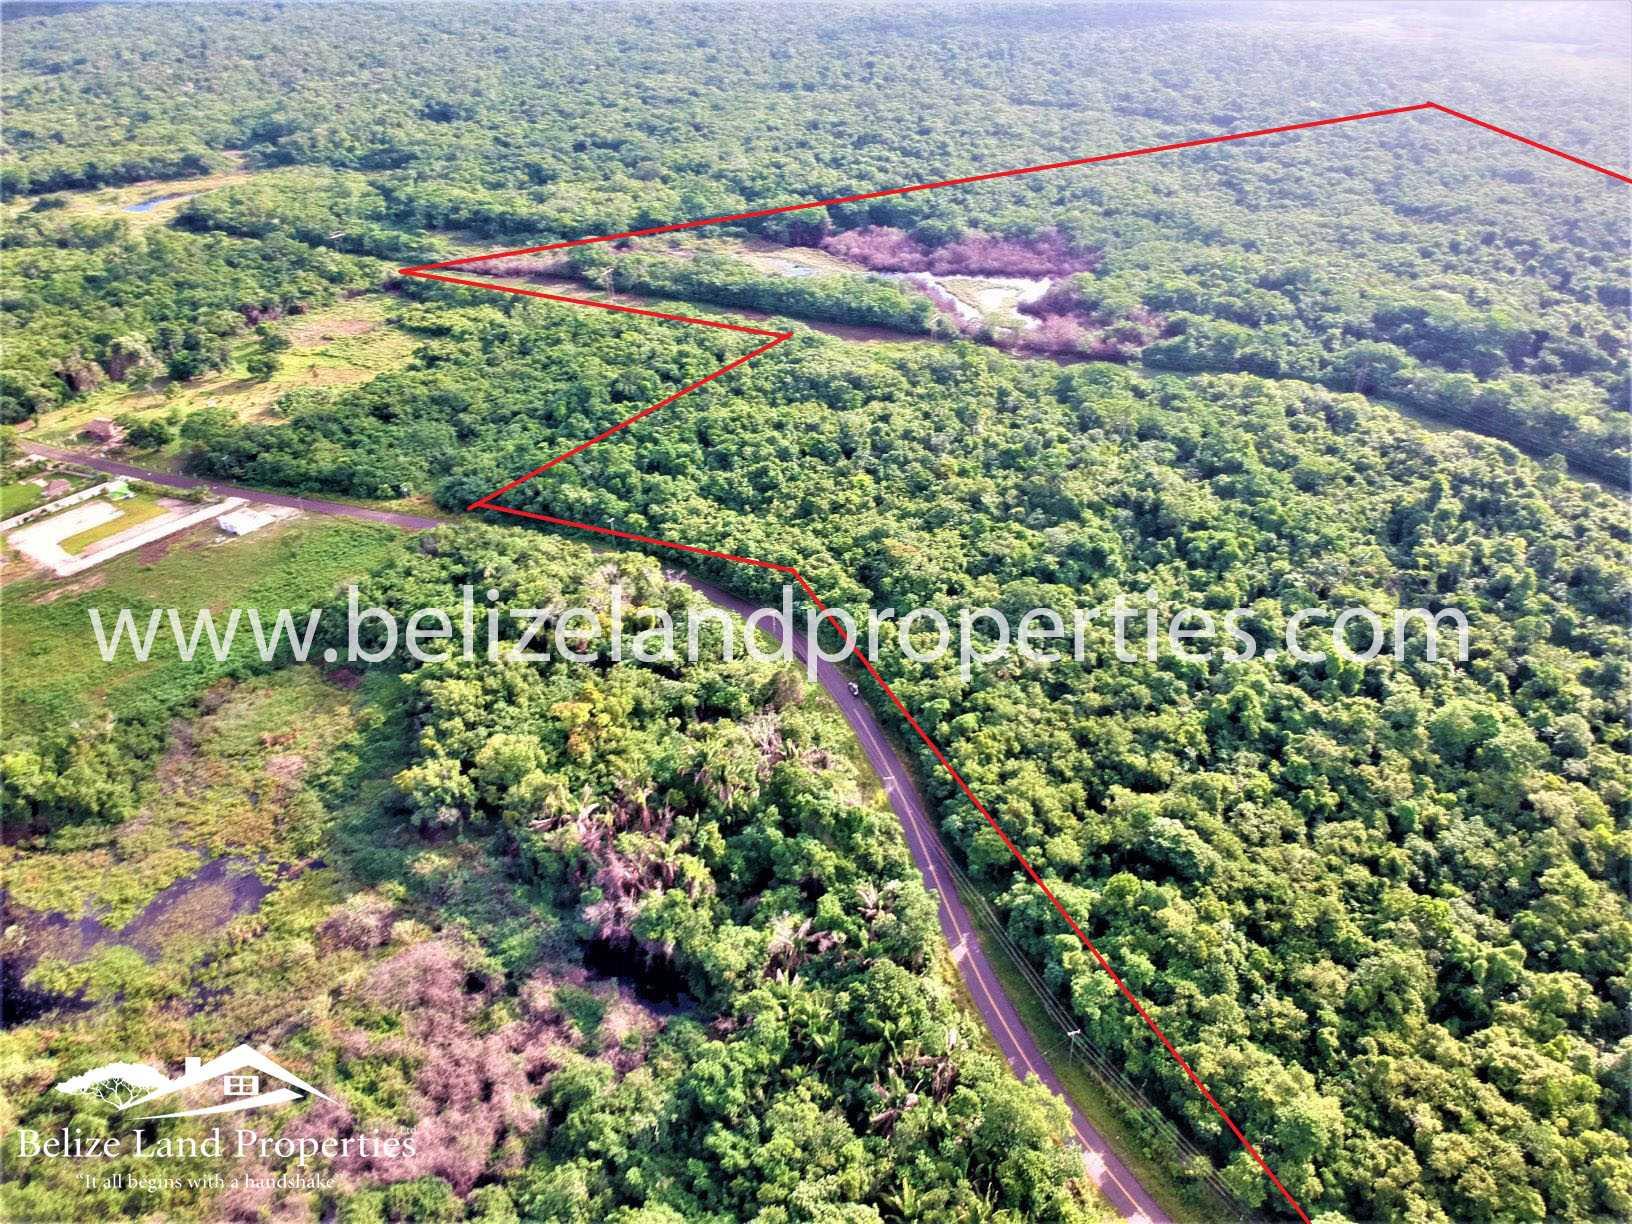 BZ150: +-122 Acres 5 miles from Sandhill Village along Old Northern Highway, Belize District!